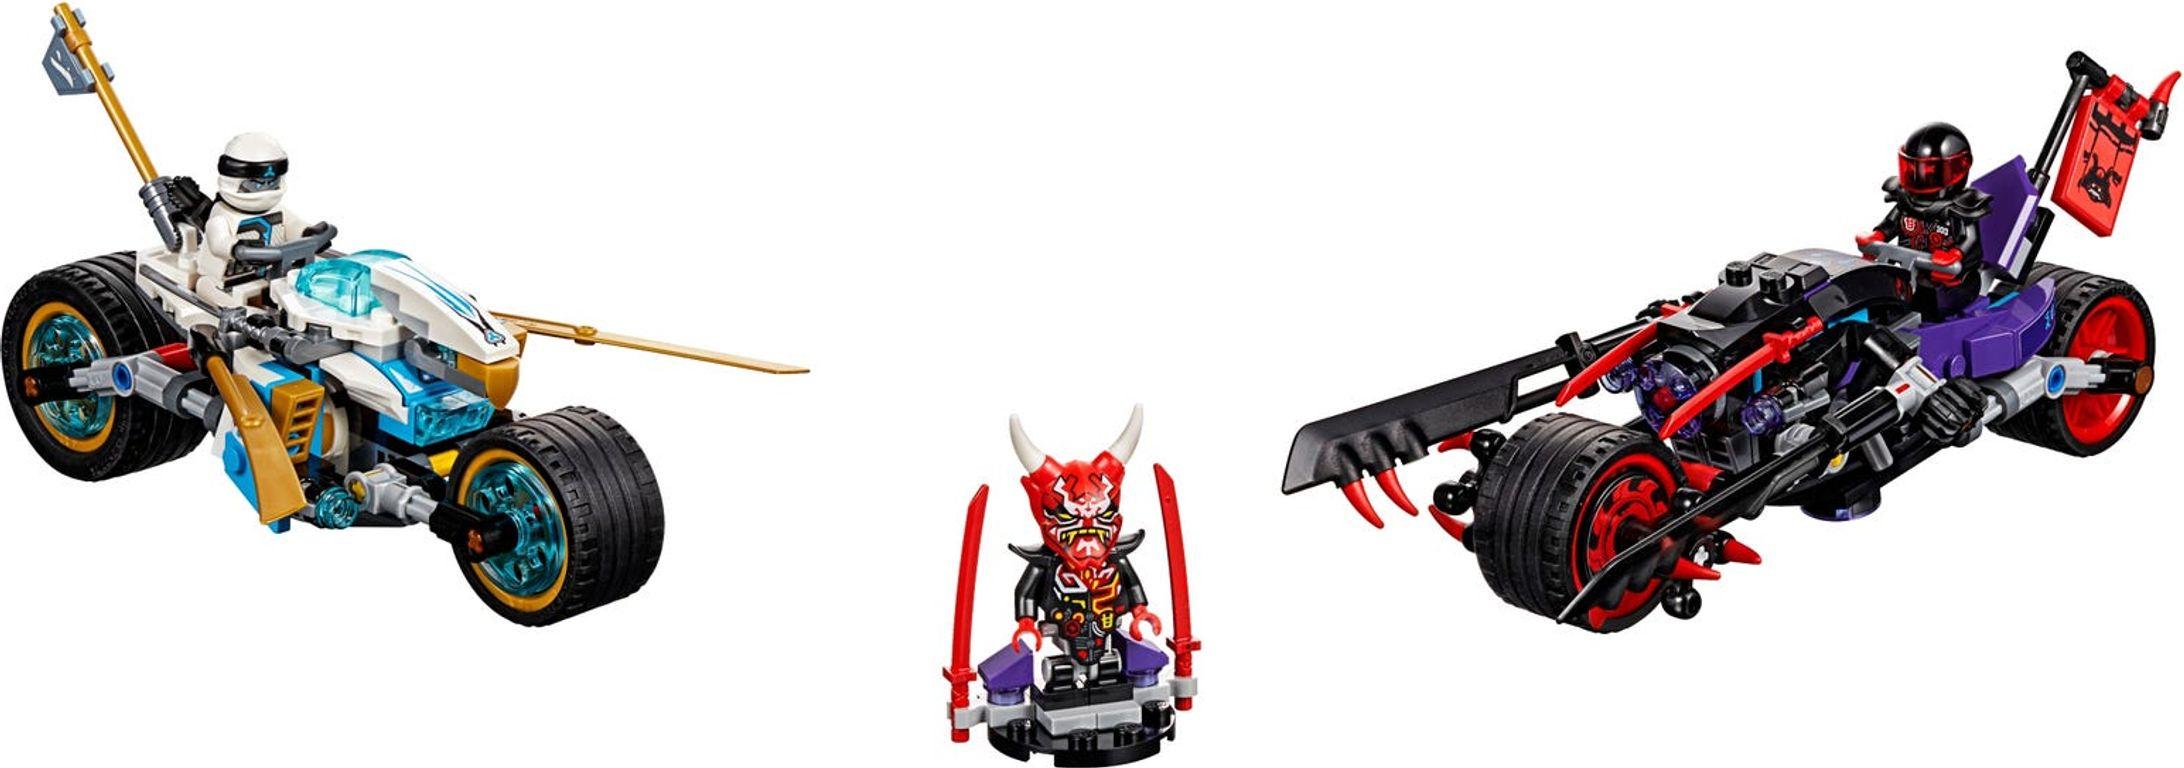 LEGO® Ninjago Street Race of Snake Jaguar components